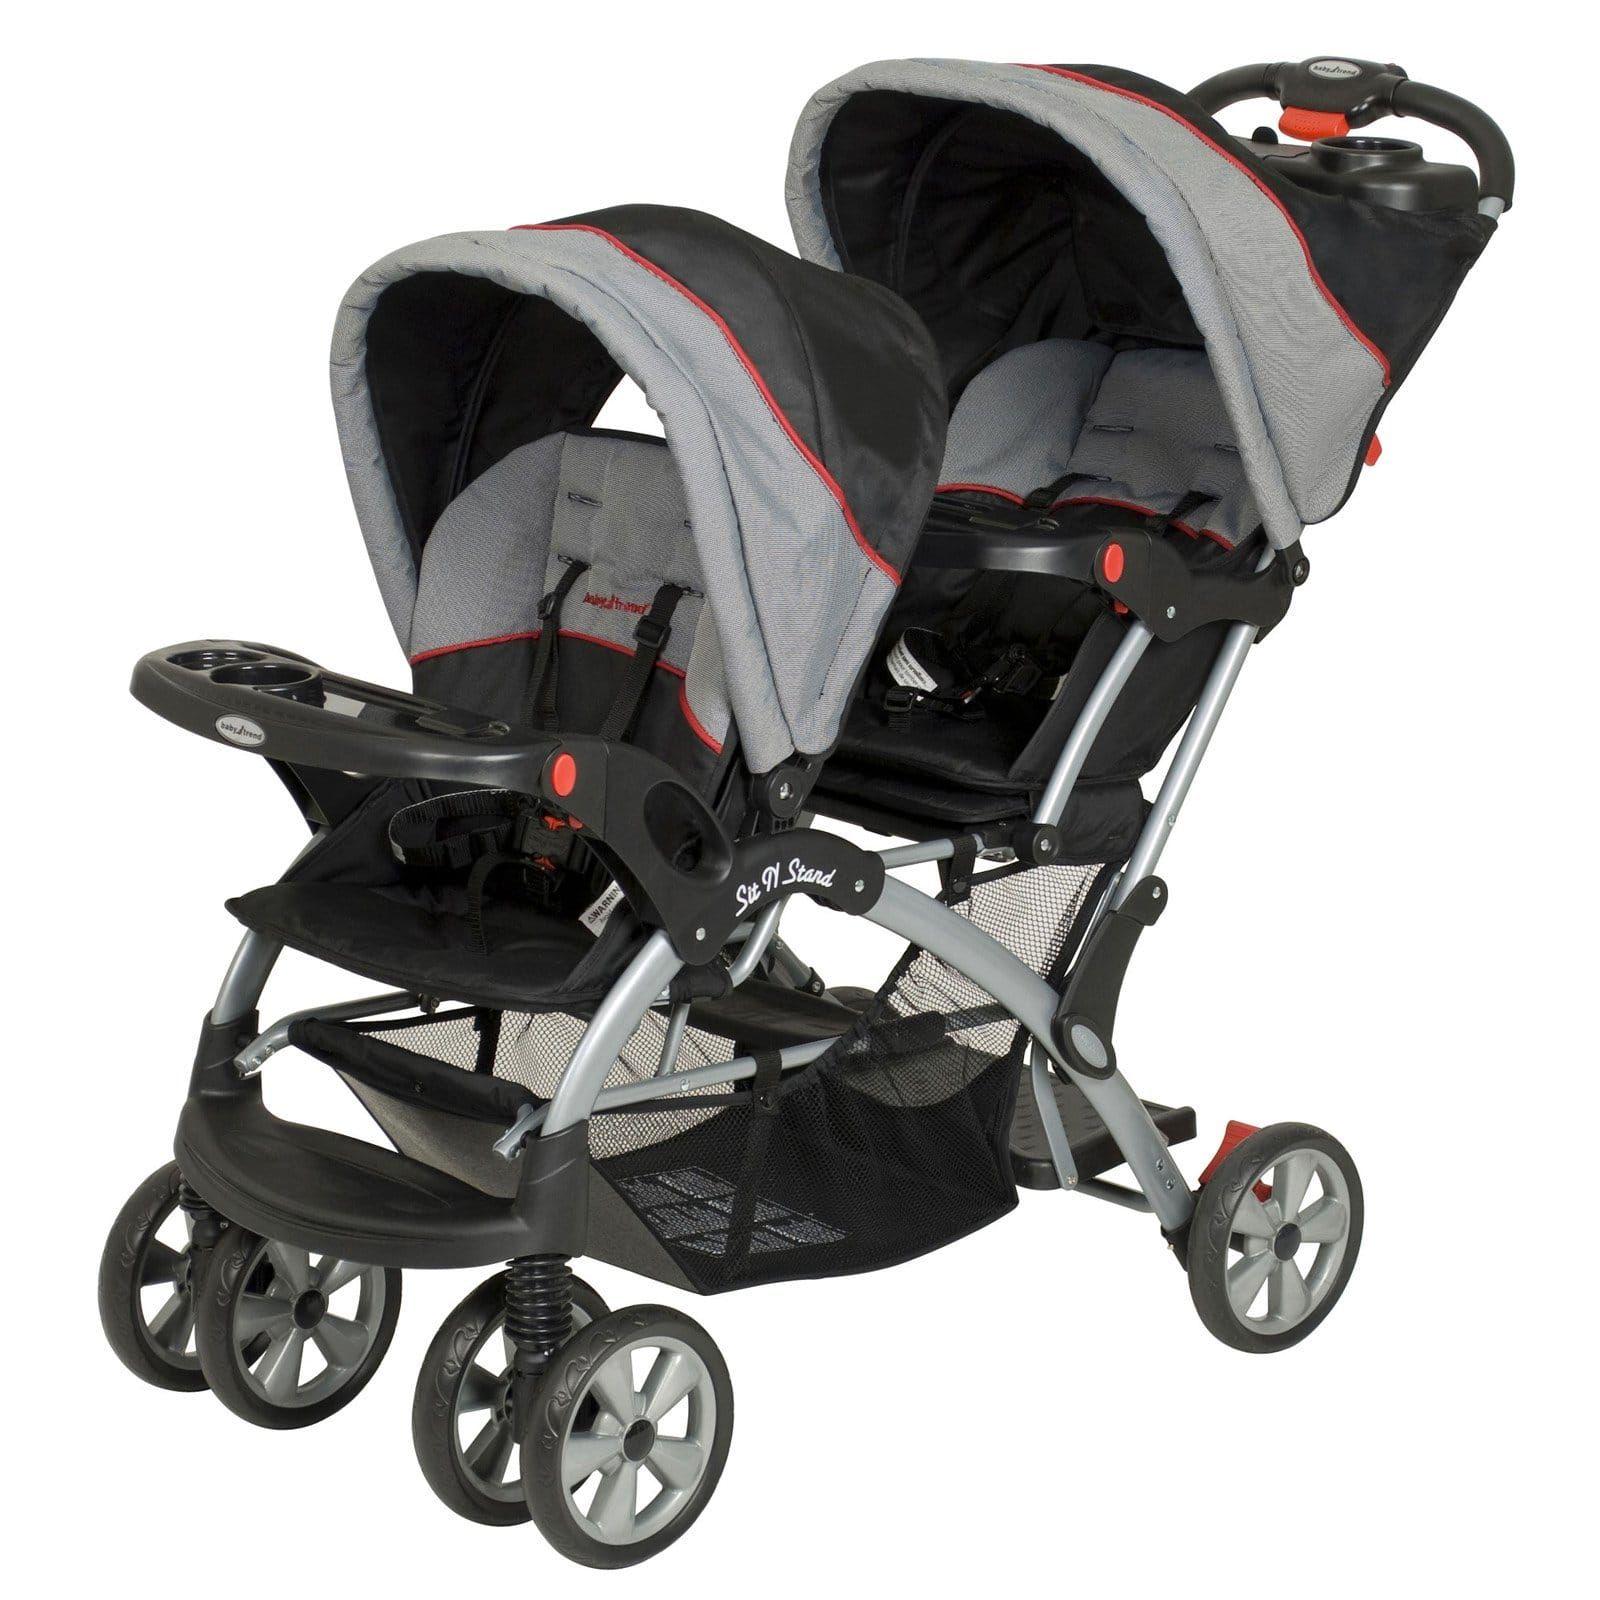 Baby Trend Sit N Stand Plus Double Stroller Millennium Single Baby Car Stroller Babystroller Affiliate In 2020 Stroller Baby Trend Double Strollers